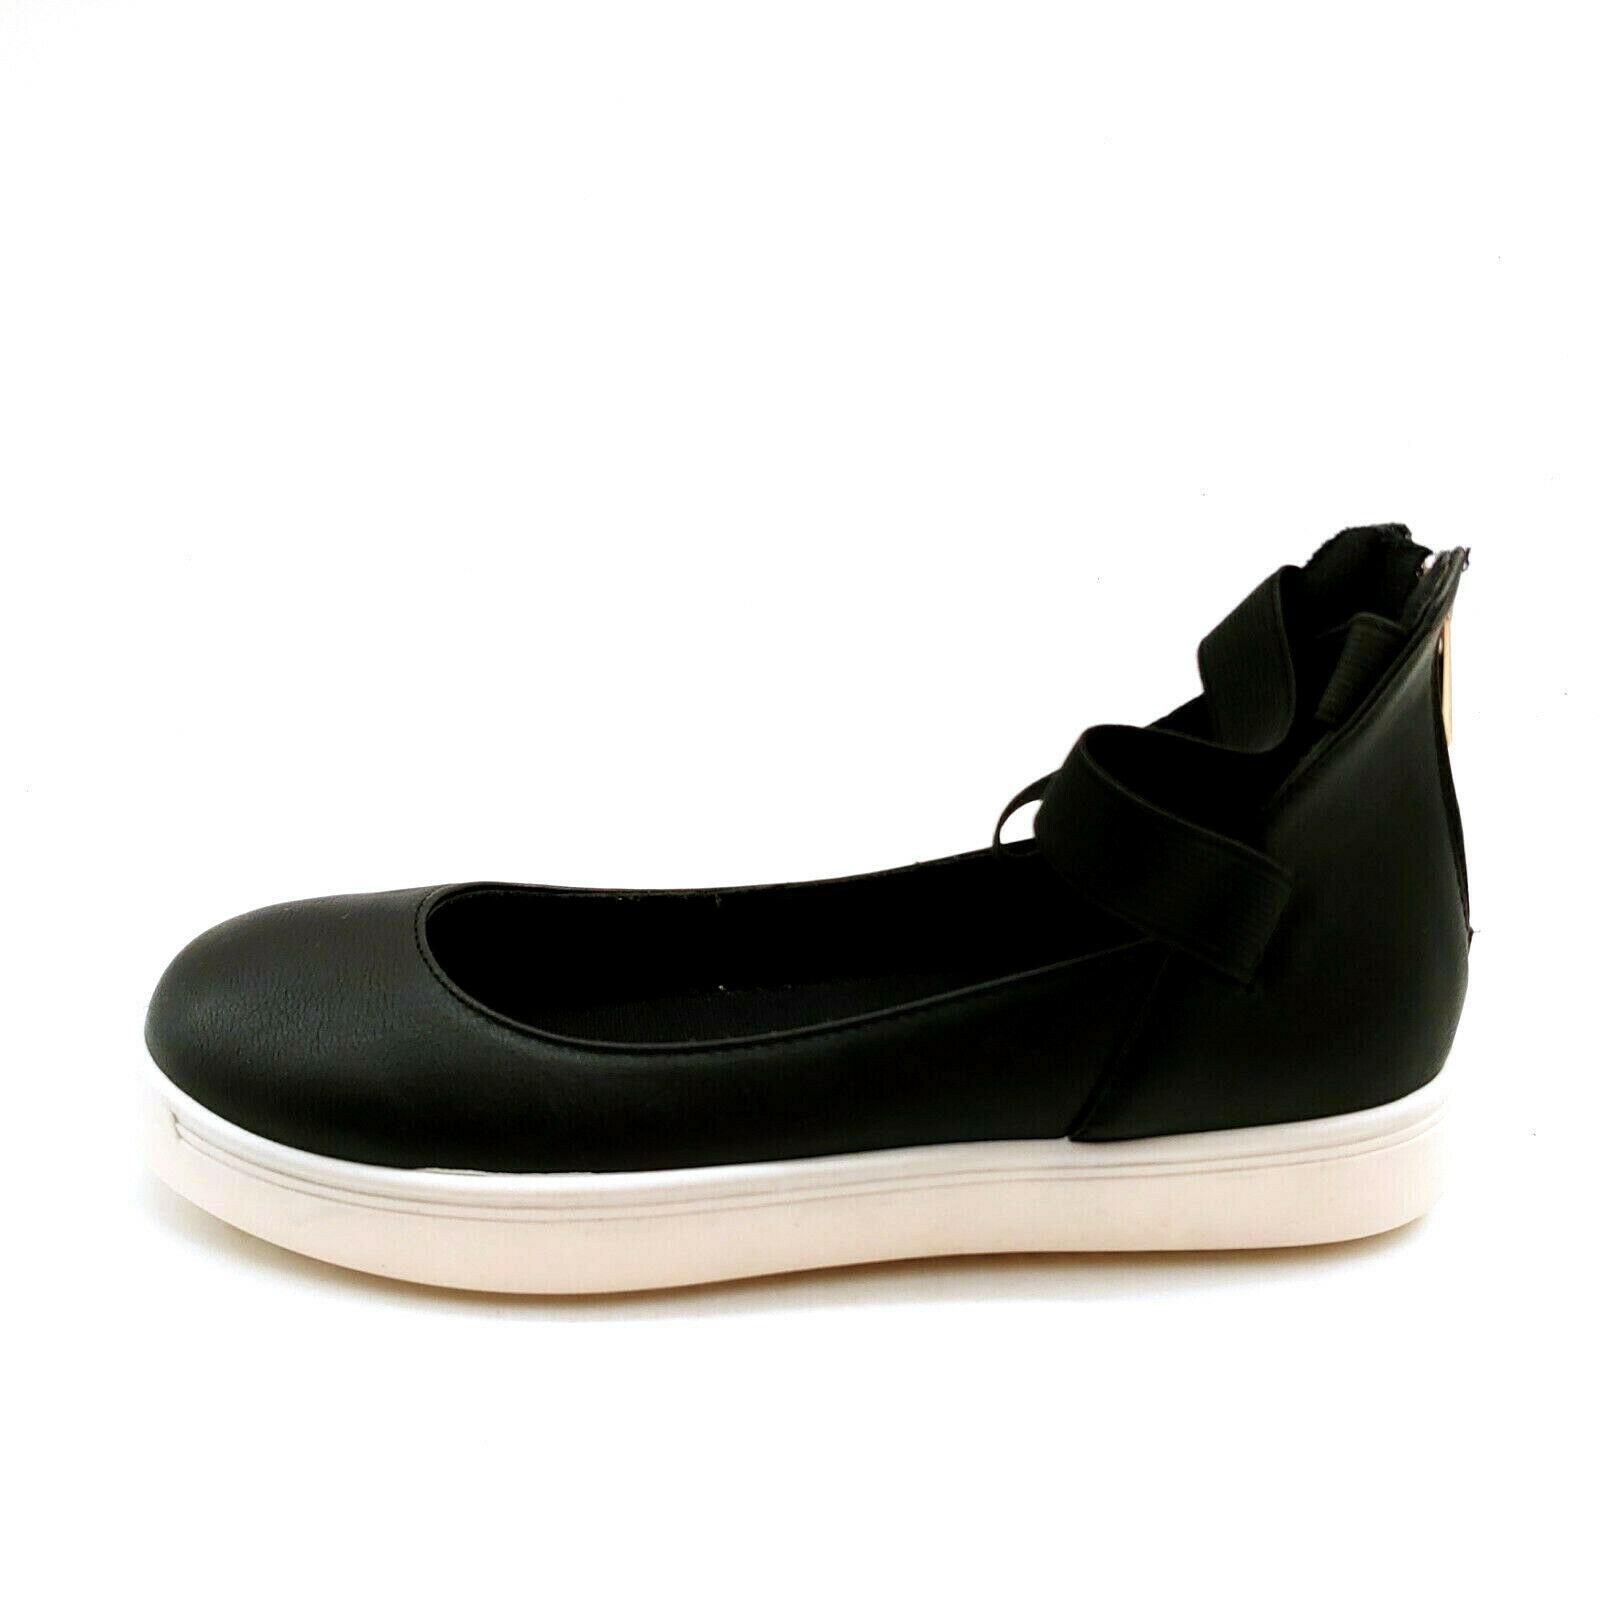 Bamboo Womans Grandslam Ankle Elastic Strap Sneaker Black Heel Zip Sz 7 M NEW - $21.45